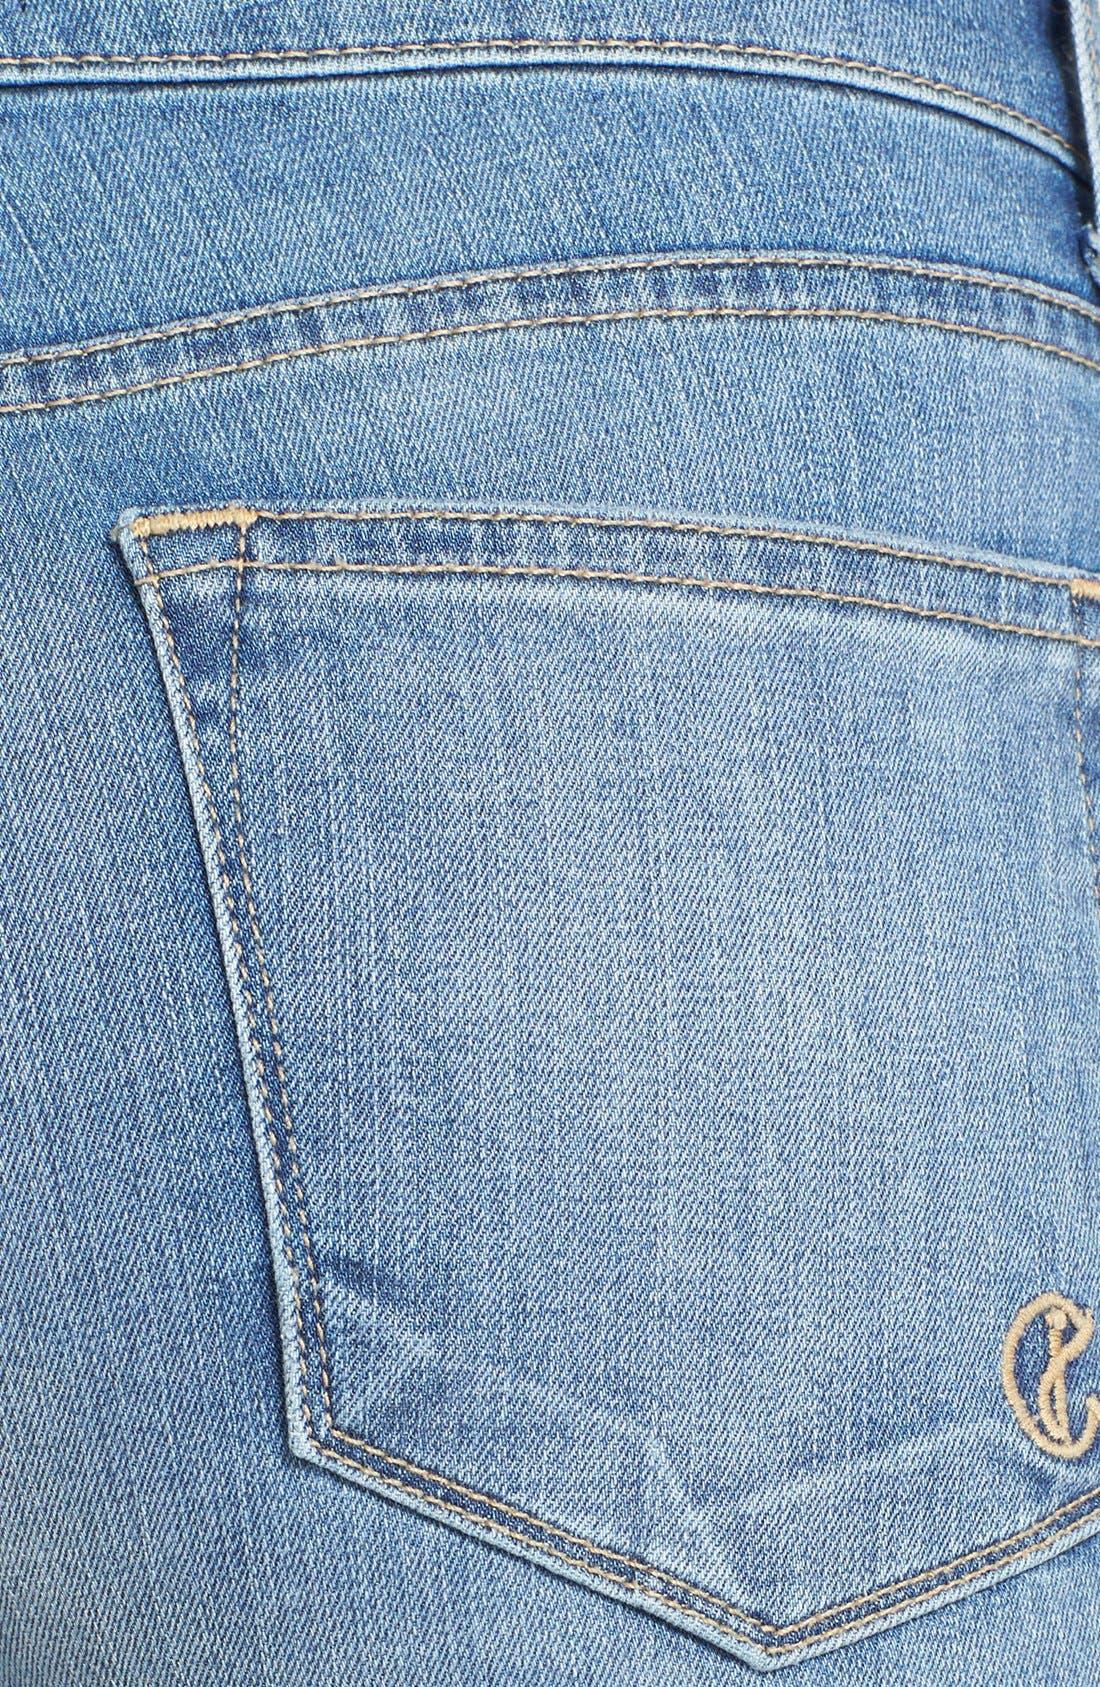 Alternate Image 3  - CJ by Cookie Johnson 'Joy' Stretch Skinny Jeans (Syreeta)